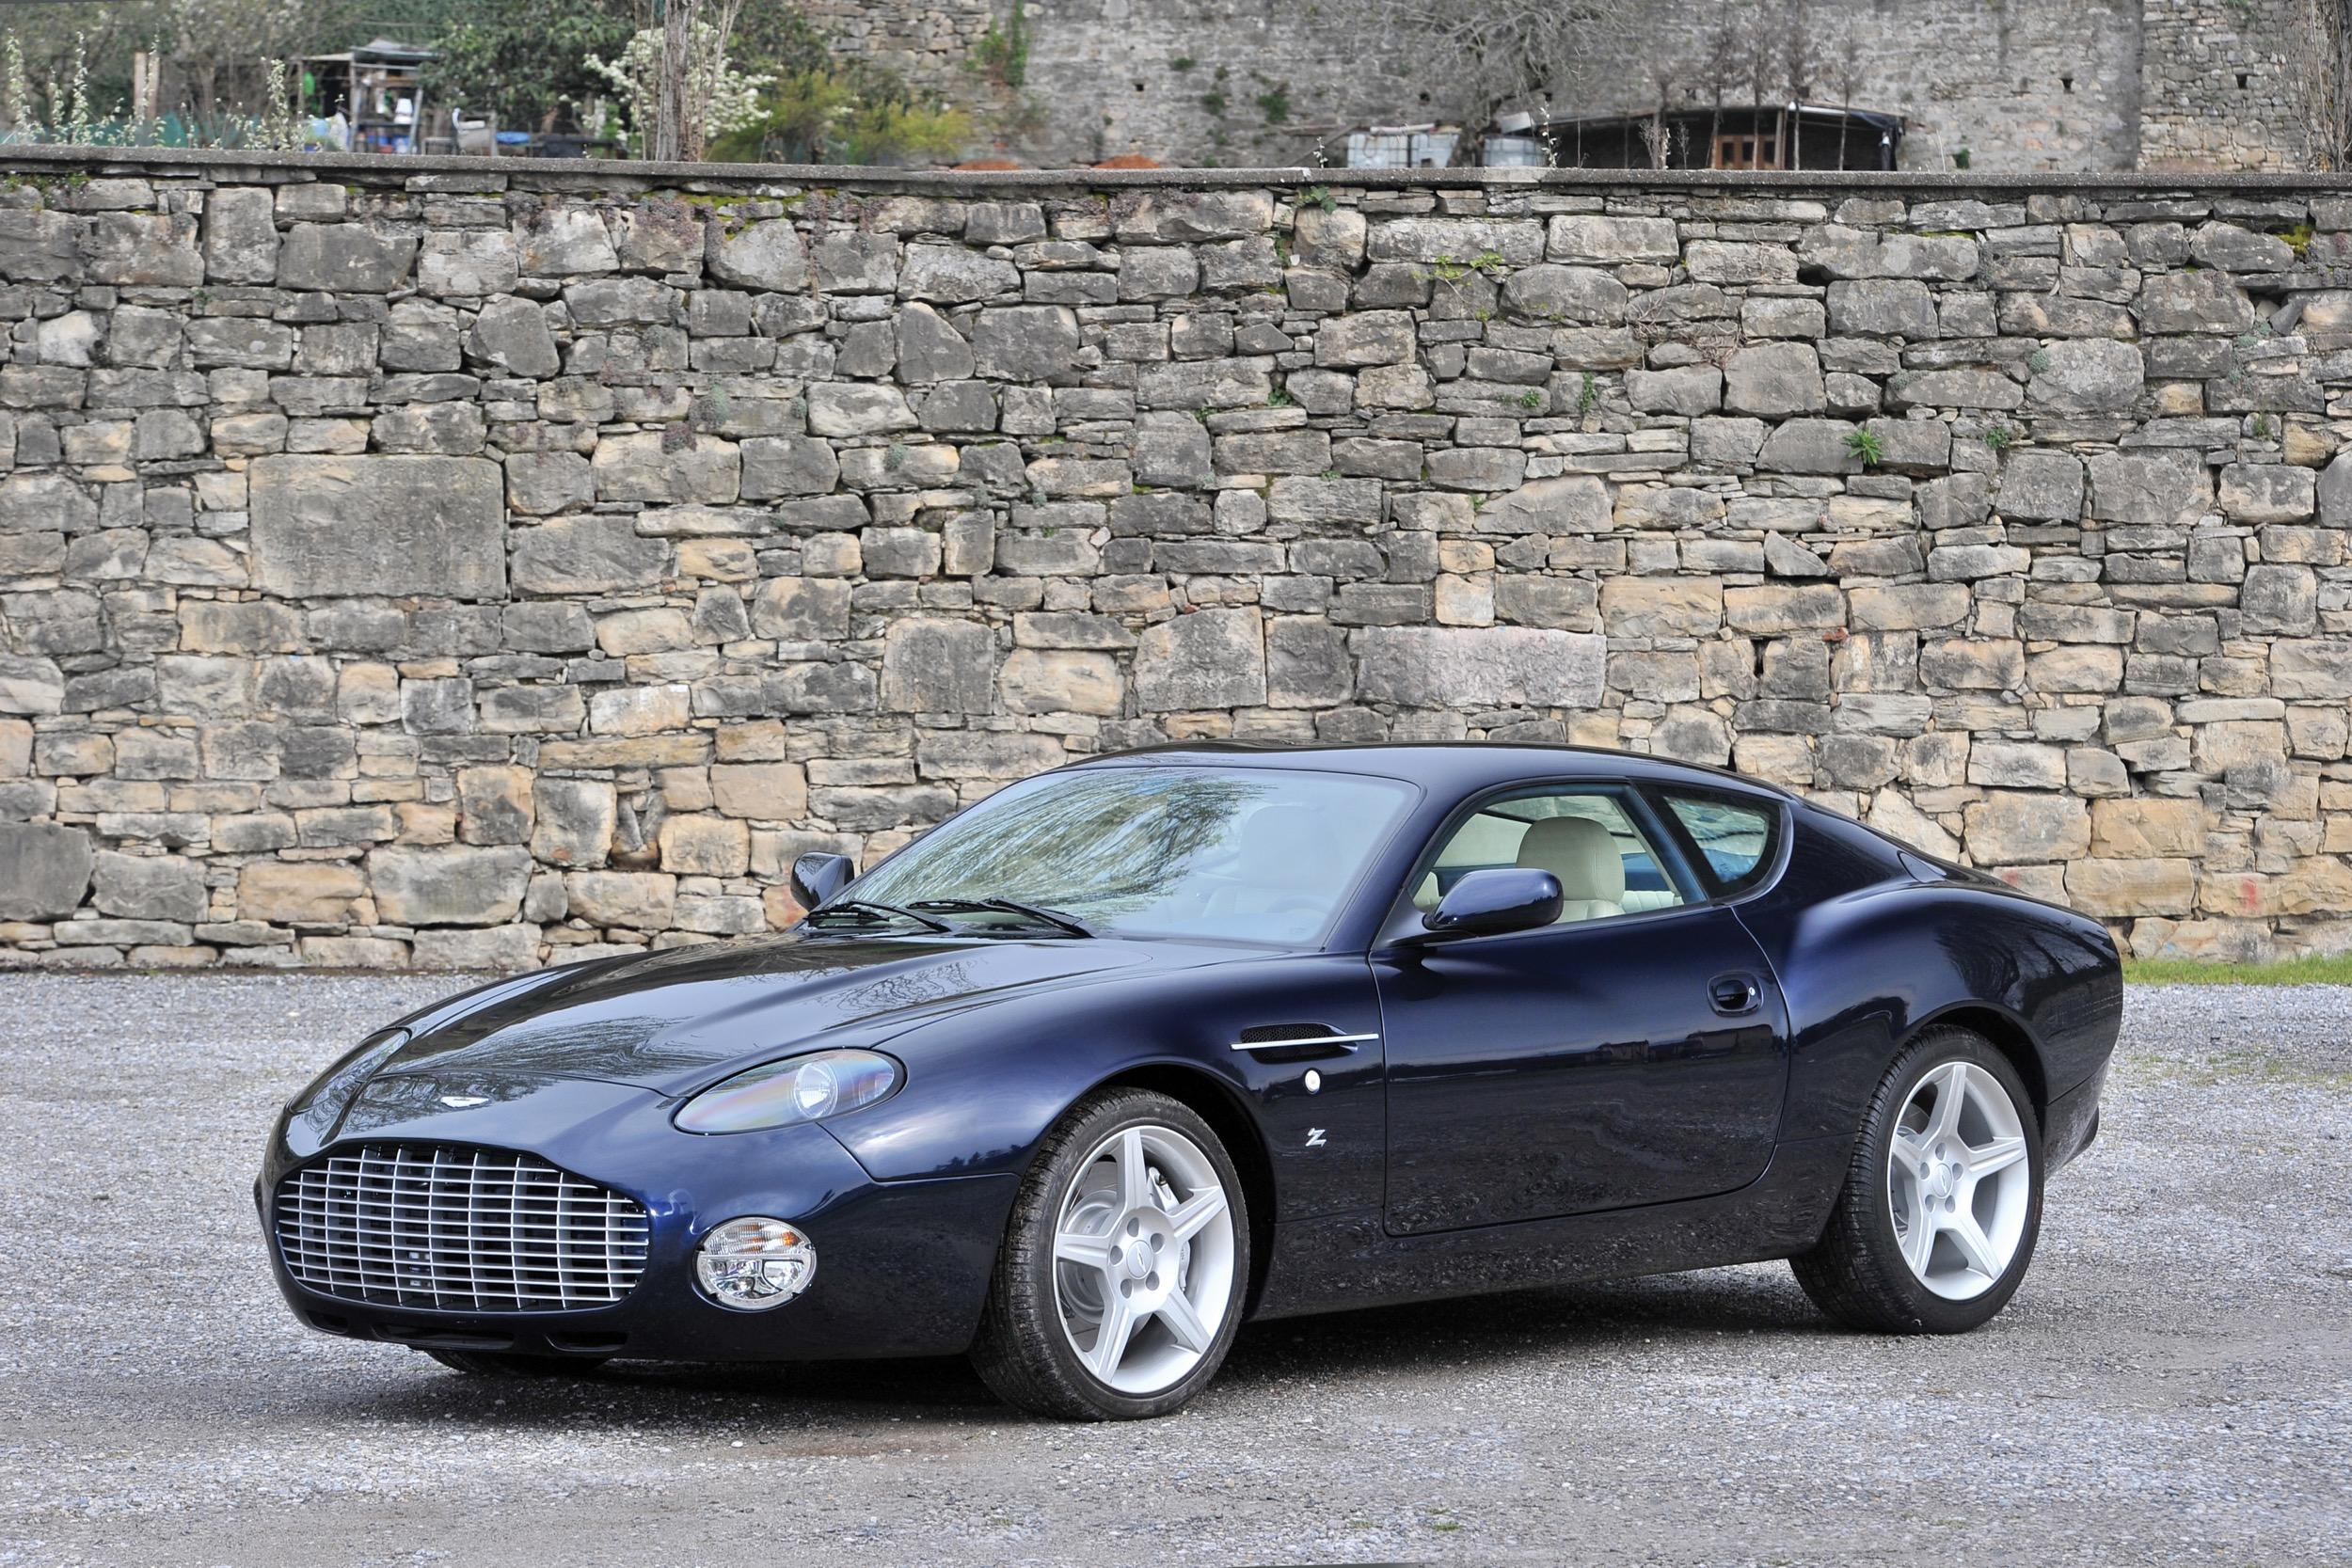 Aston Martin Db7 V12 Zagato Radicalmag